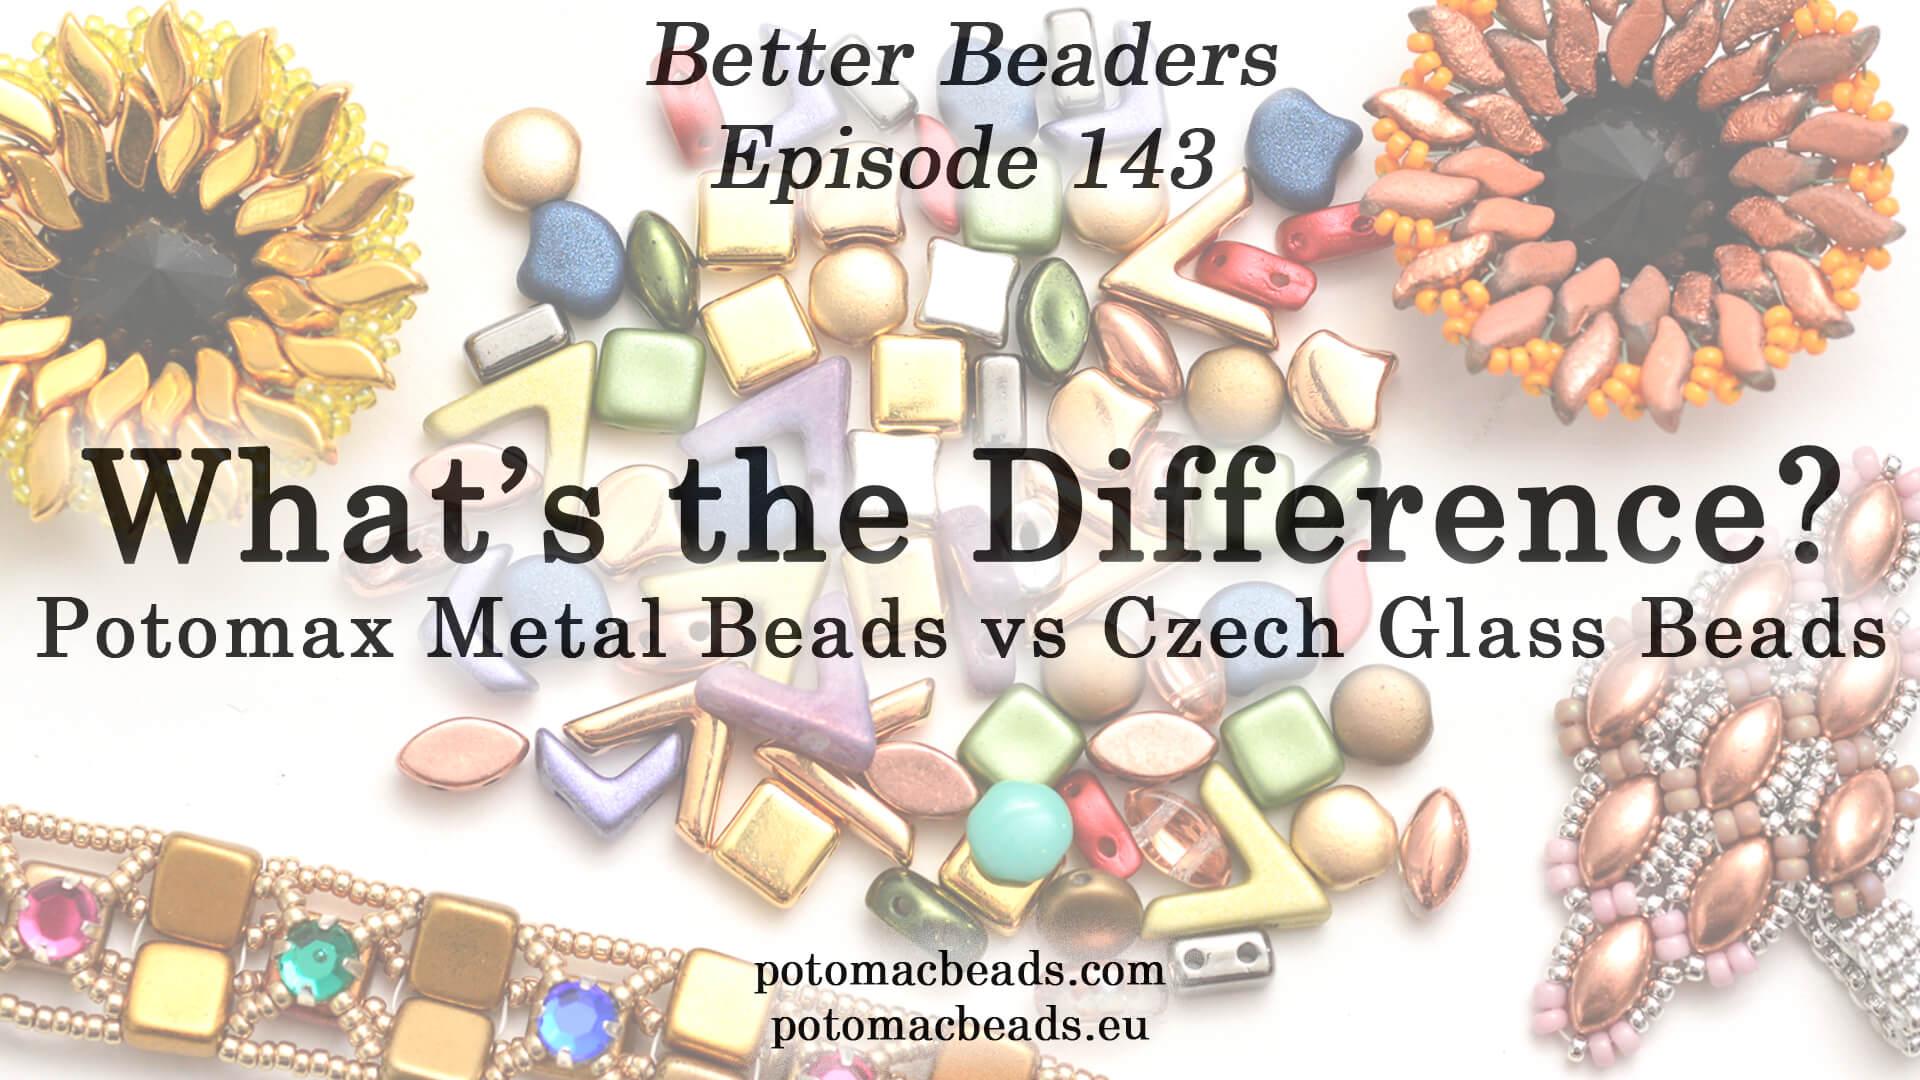 How to Bead / Better Beader Episodes / Better Beader Episode 143 - Difference Between Potomax Metal Beads vs Czech Glass Beads